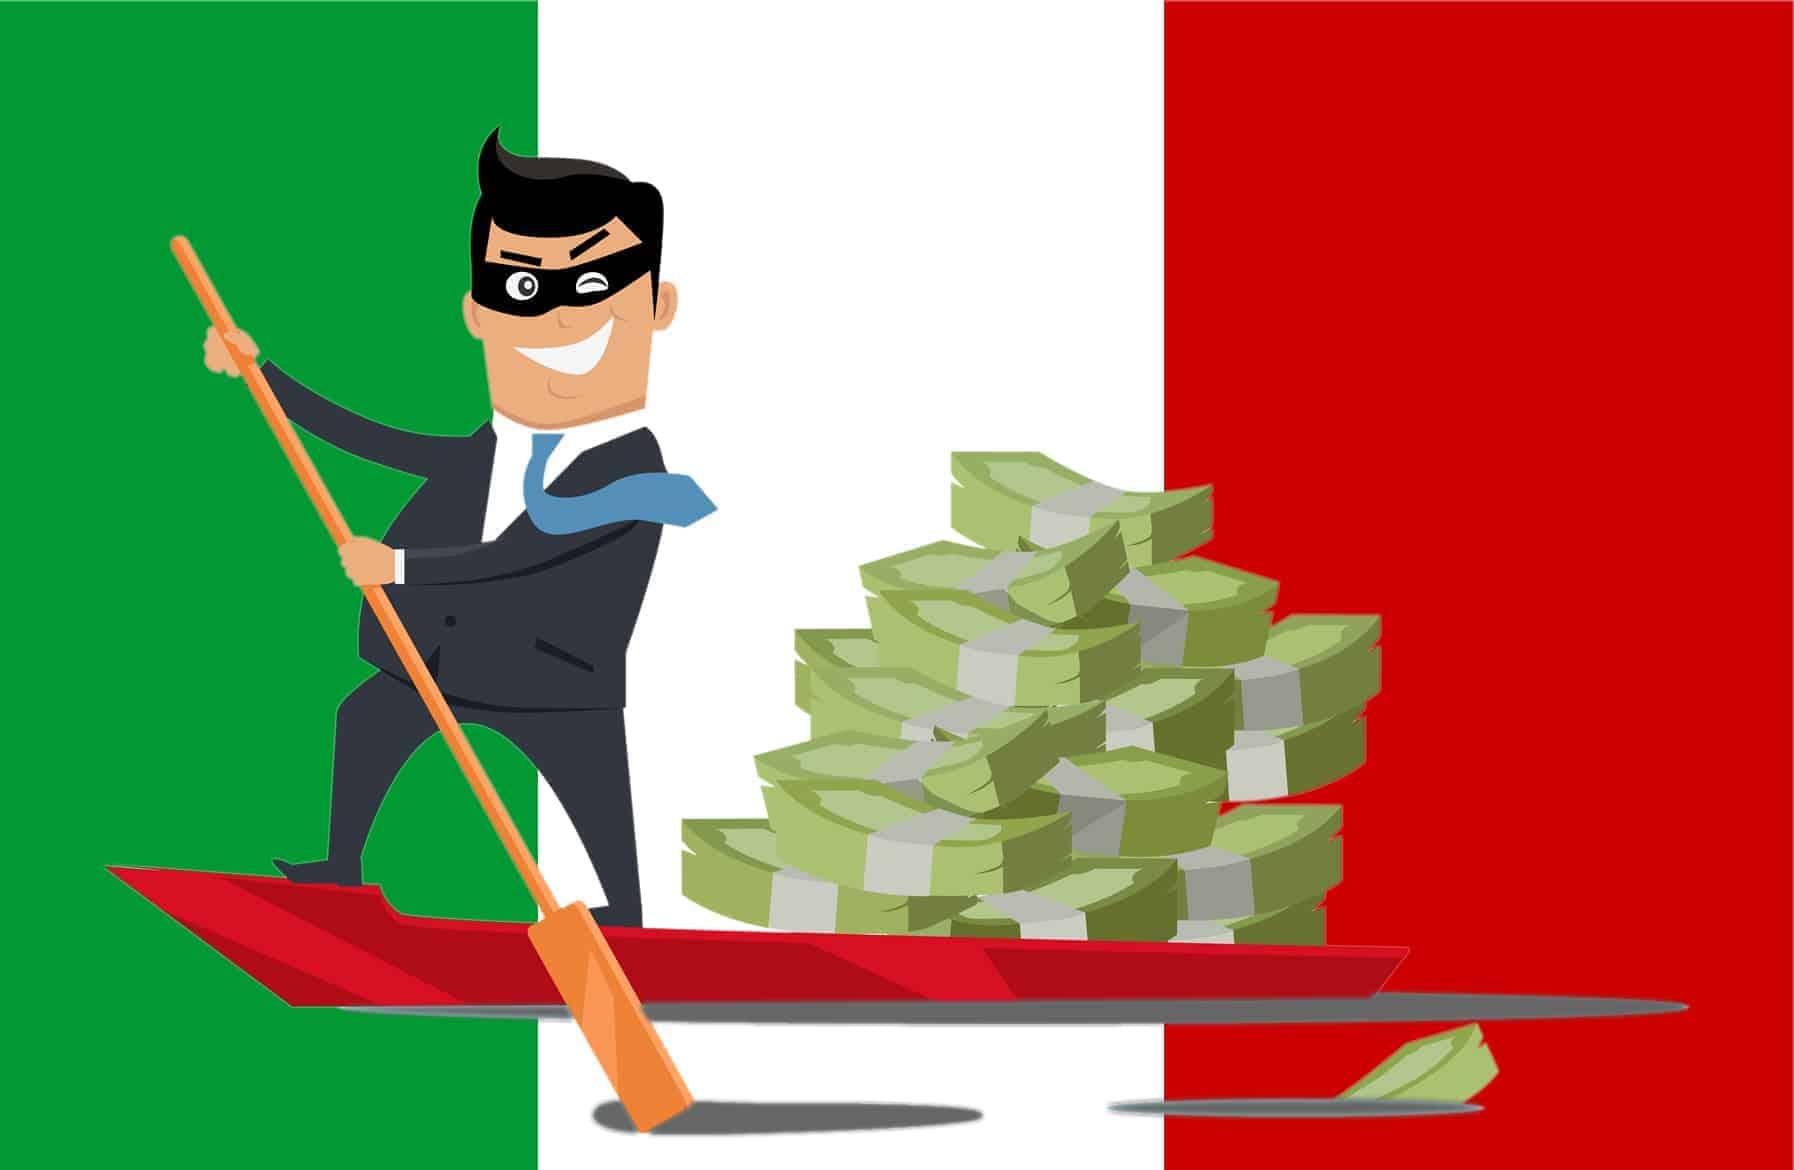 informareonline-evasione-fiscale-italiana